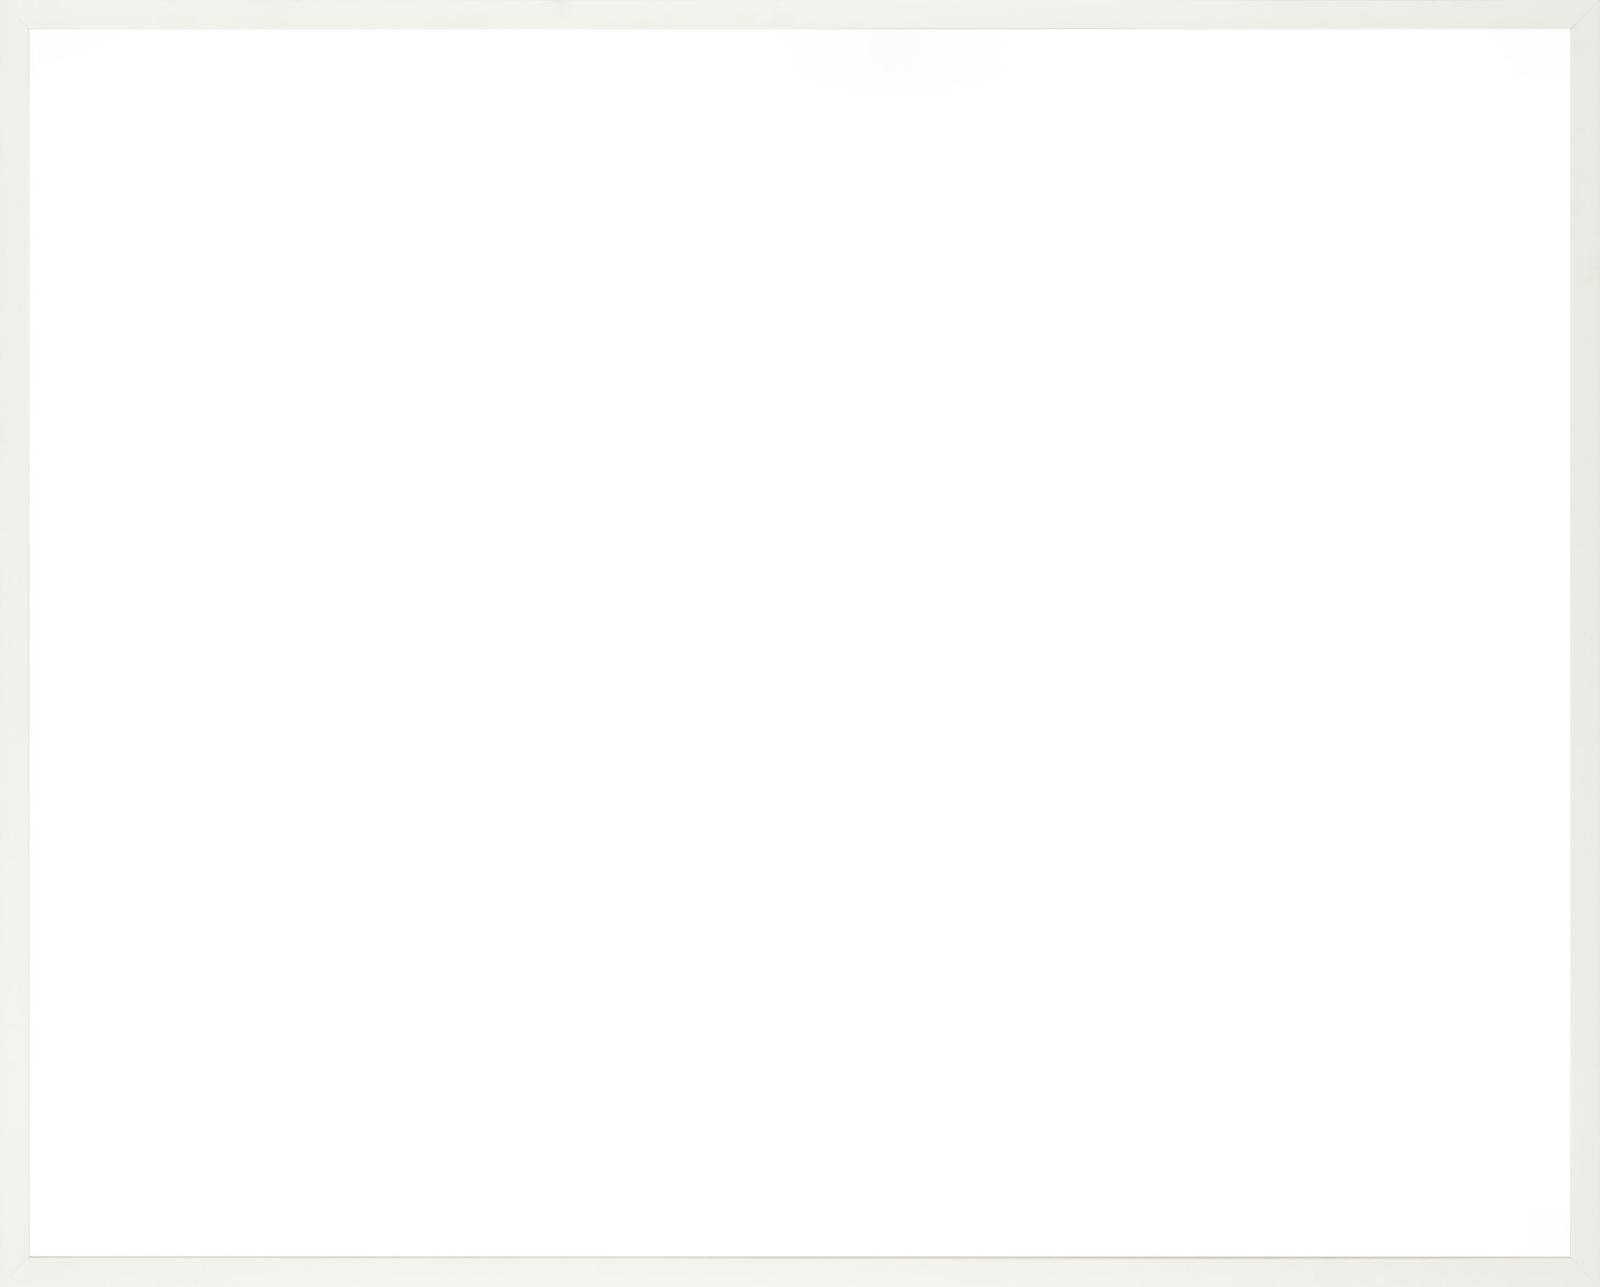 Paper Frame Horizontal White